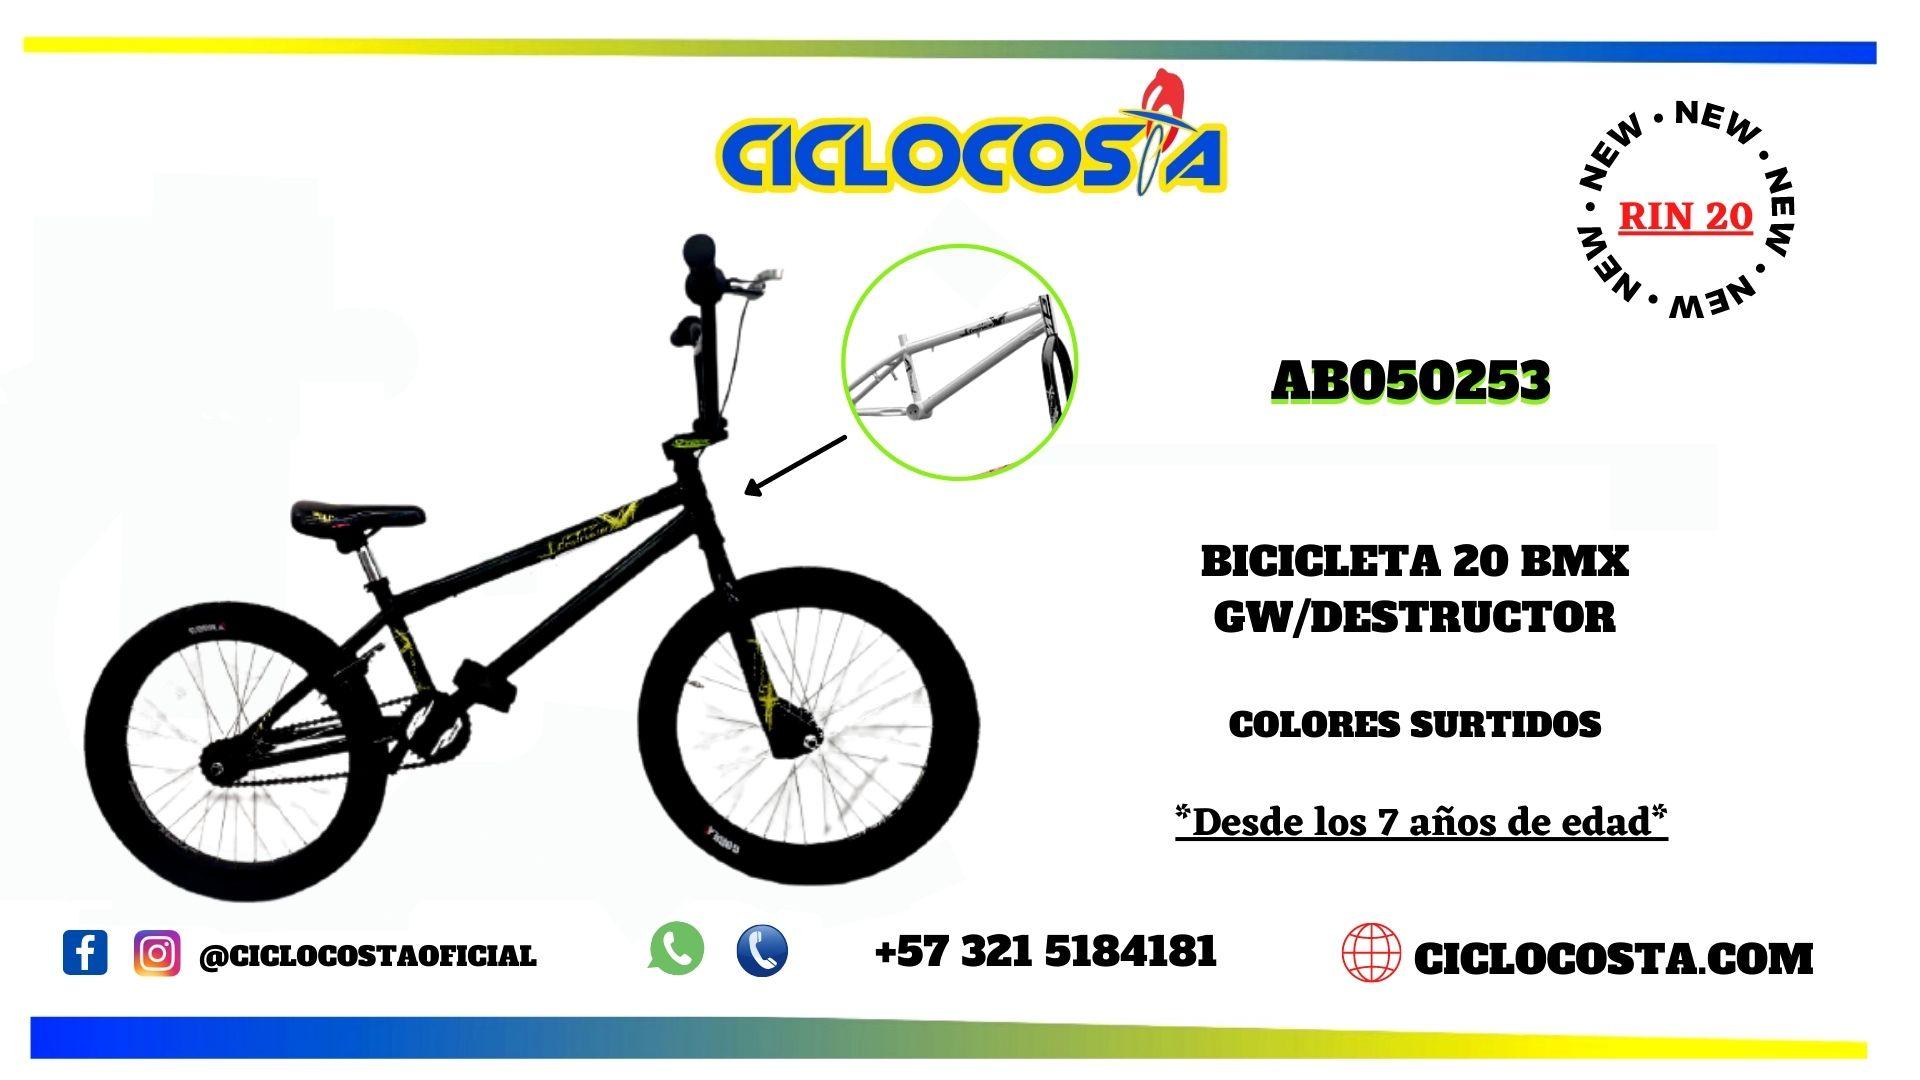 AB050253